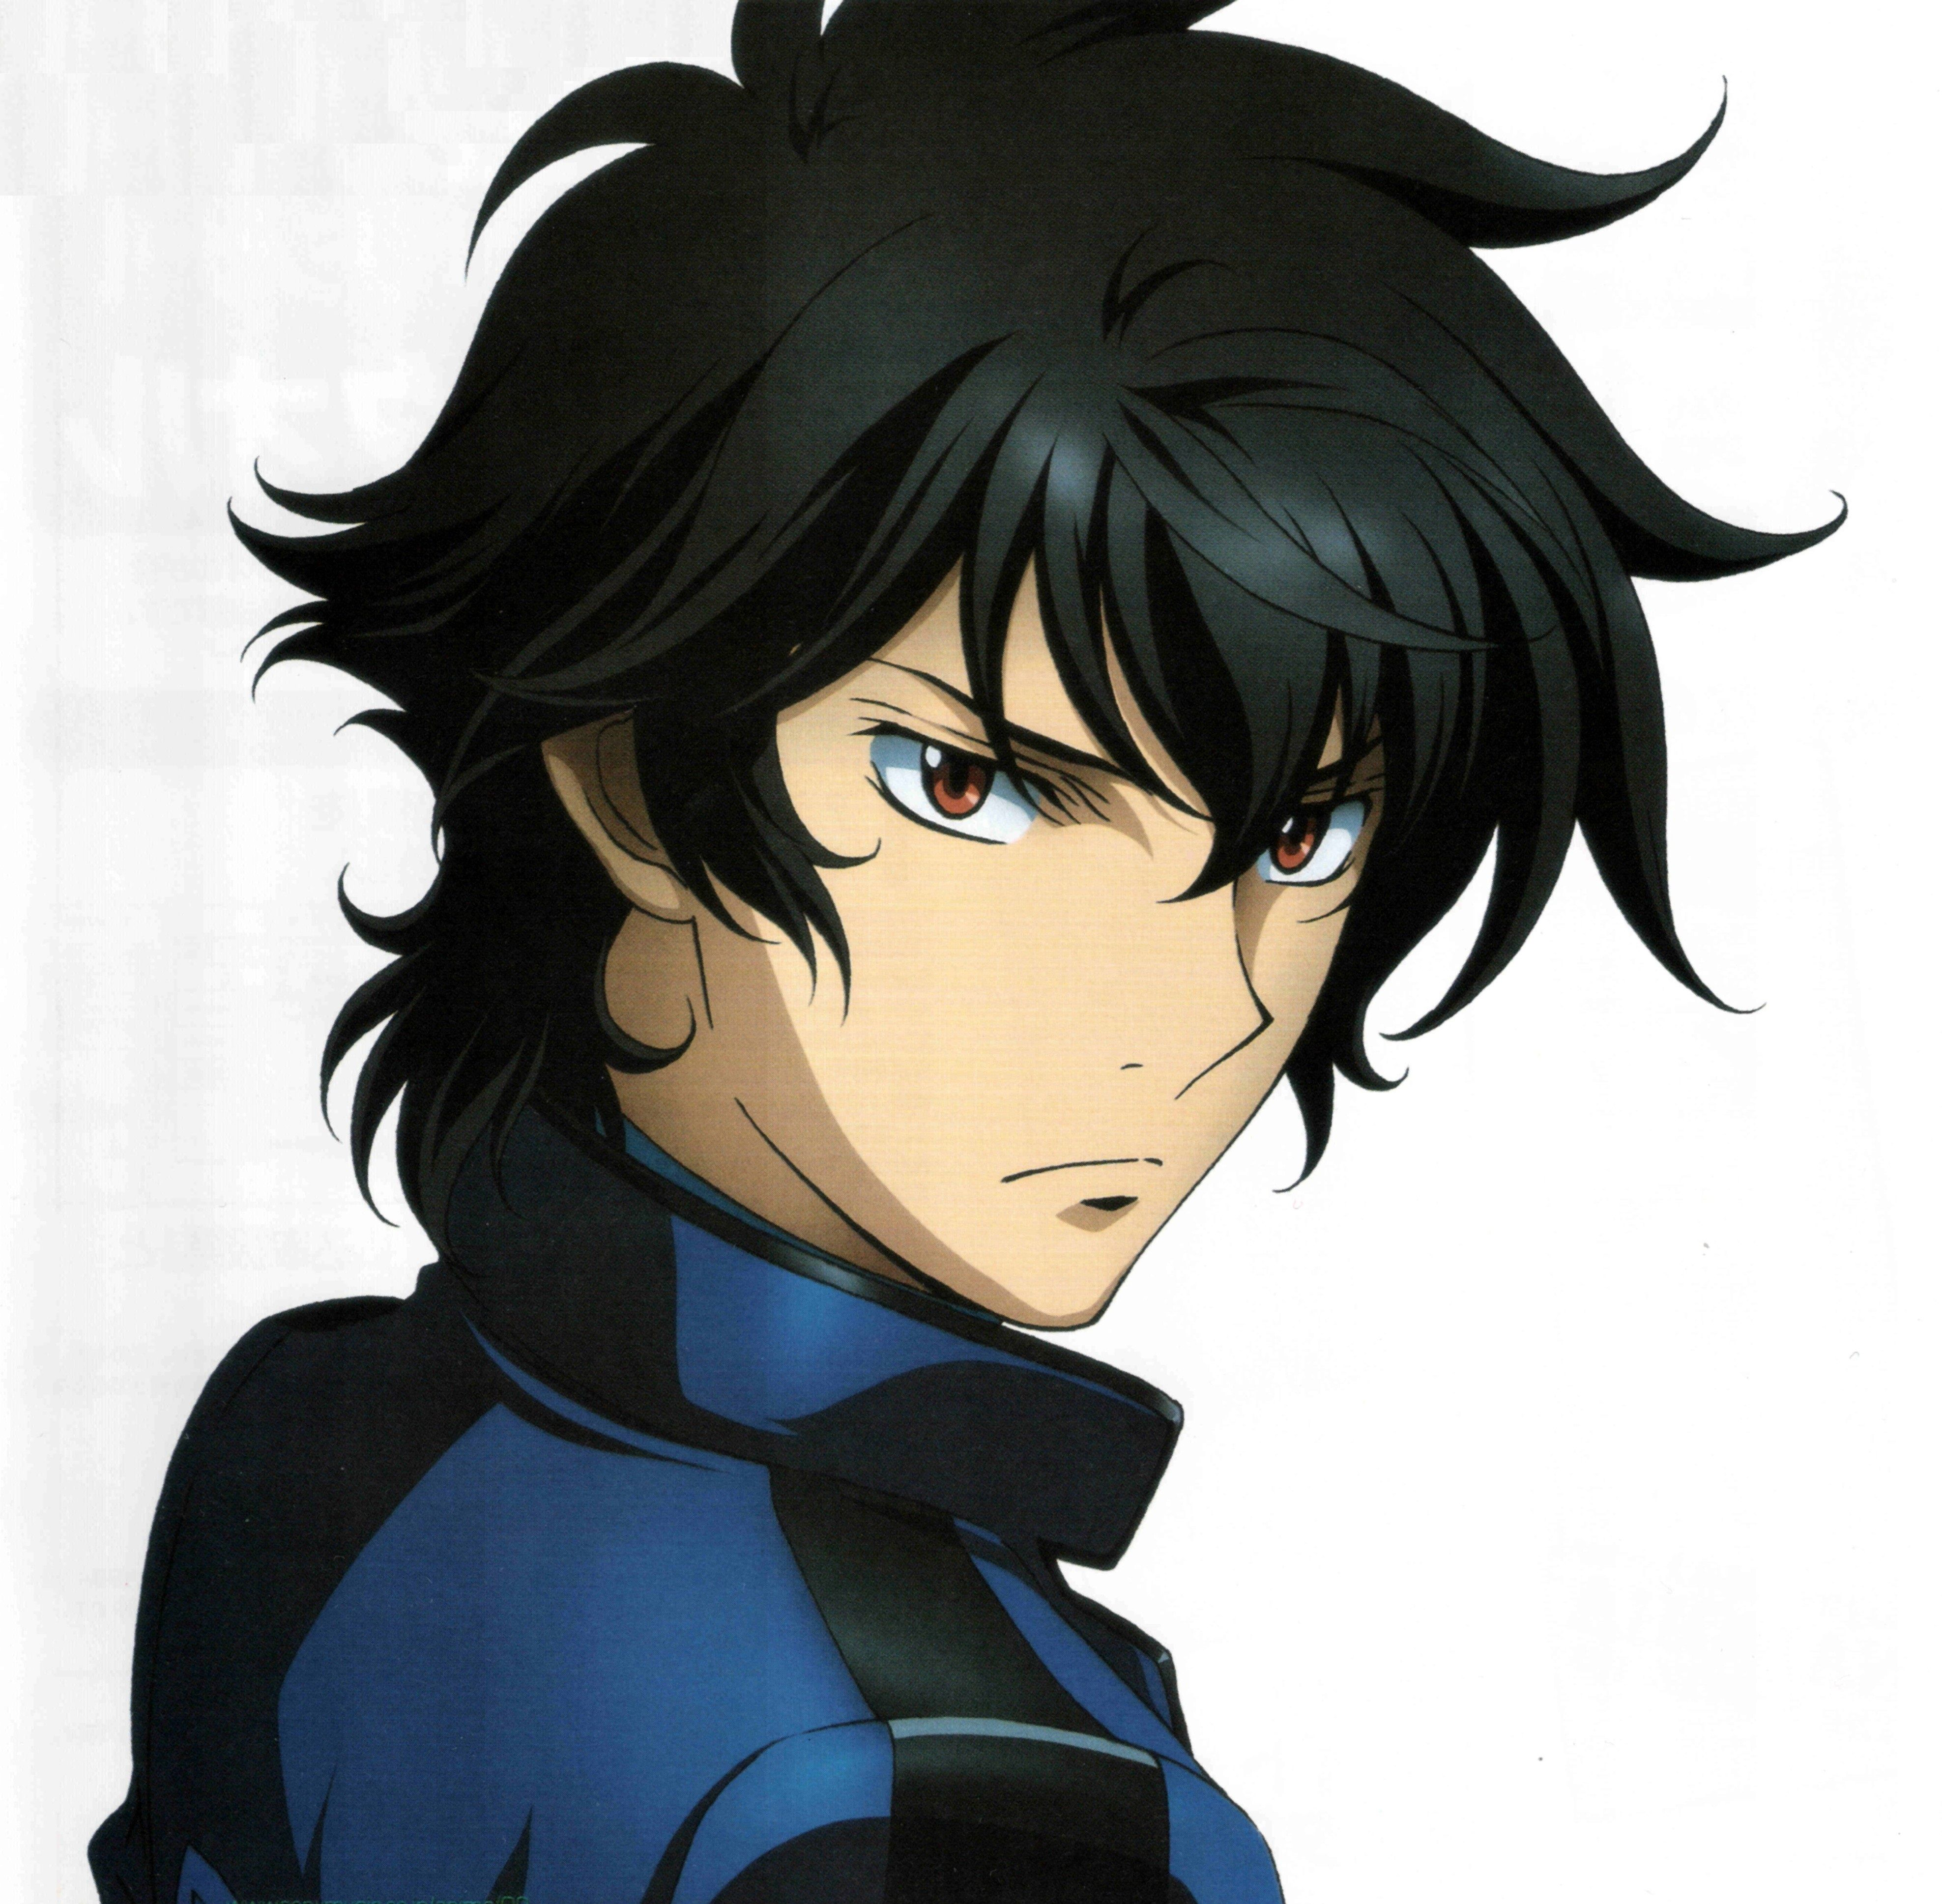 Setsuna F Seiei Soran Ibrahim From Mobile Suit Gundam 00 Gundam 00 Mobile Suit Gundam 00 Gundam